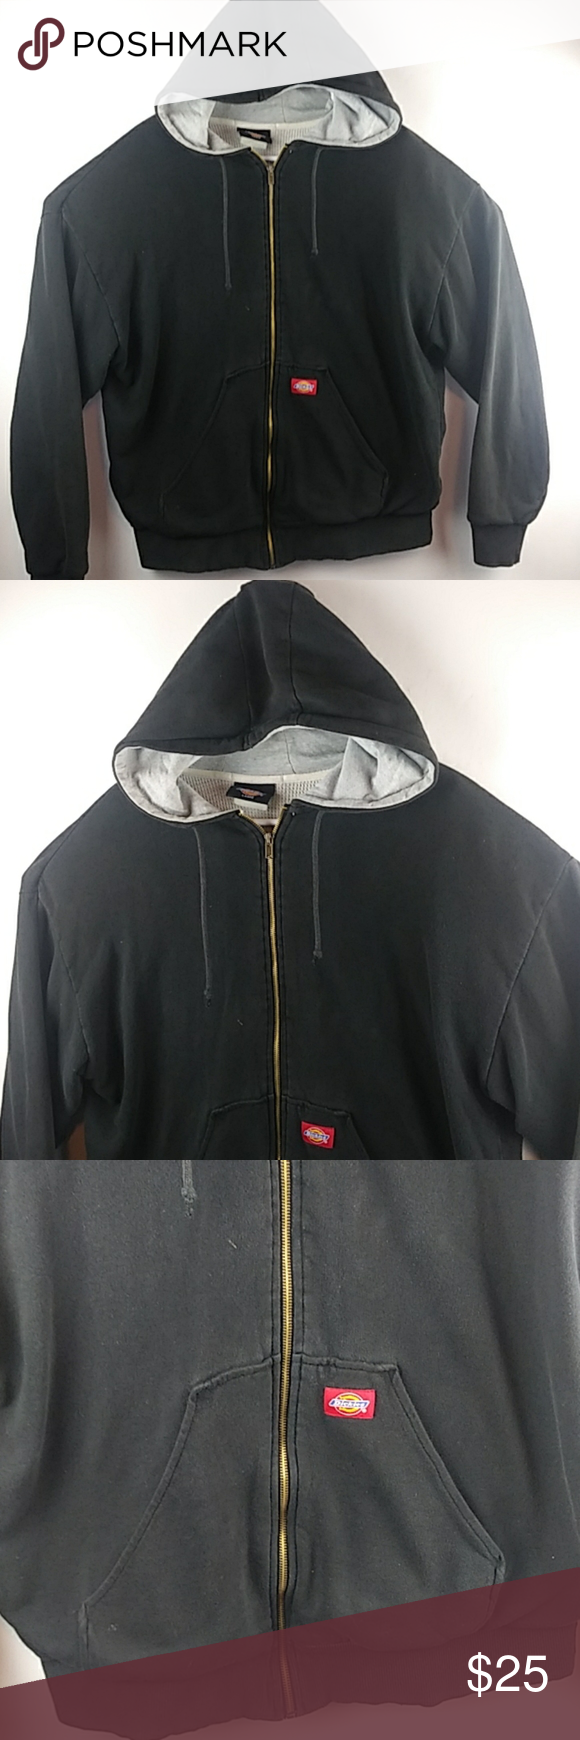 Dickies Thermal Lined Zip Up Hoodie Sweatshirt Good Used Condition Dickies Thermal Lined Zip Up Hoodie Sweatshirt Me Sweatshirts Hoodie Clothes Design Zip Ups [ 1740 x 580 Pixel ]